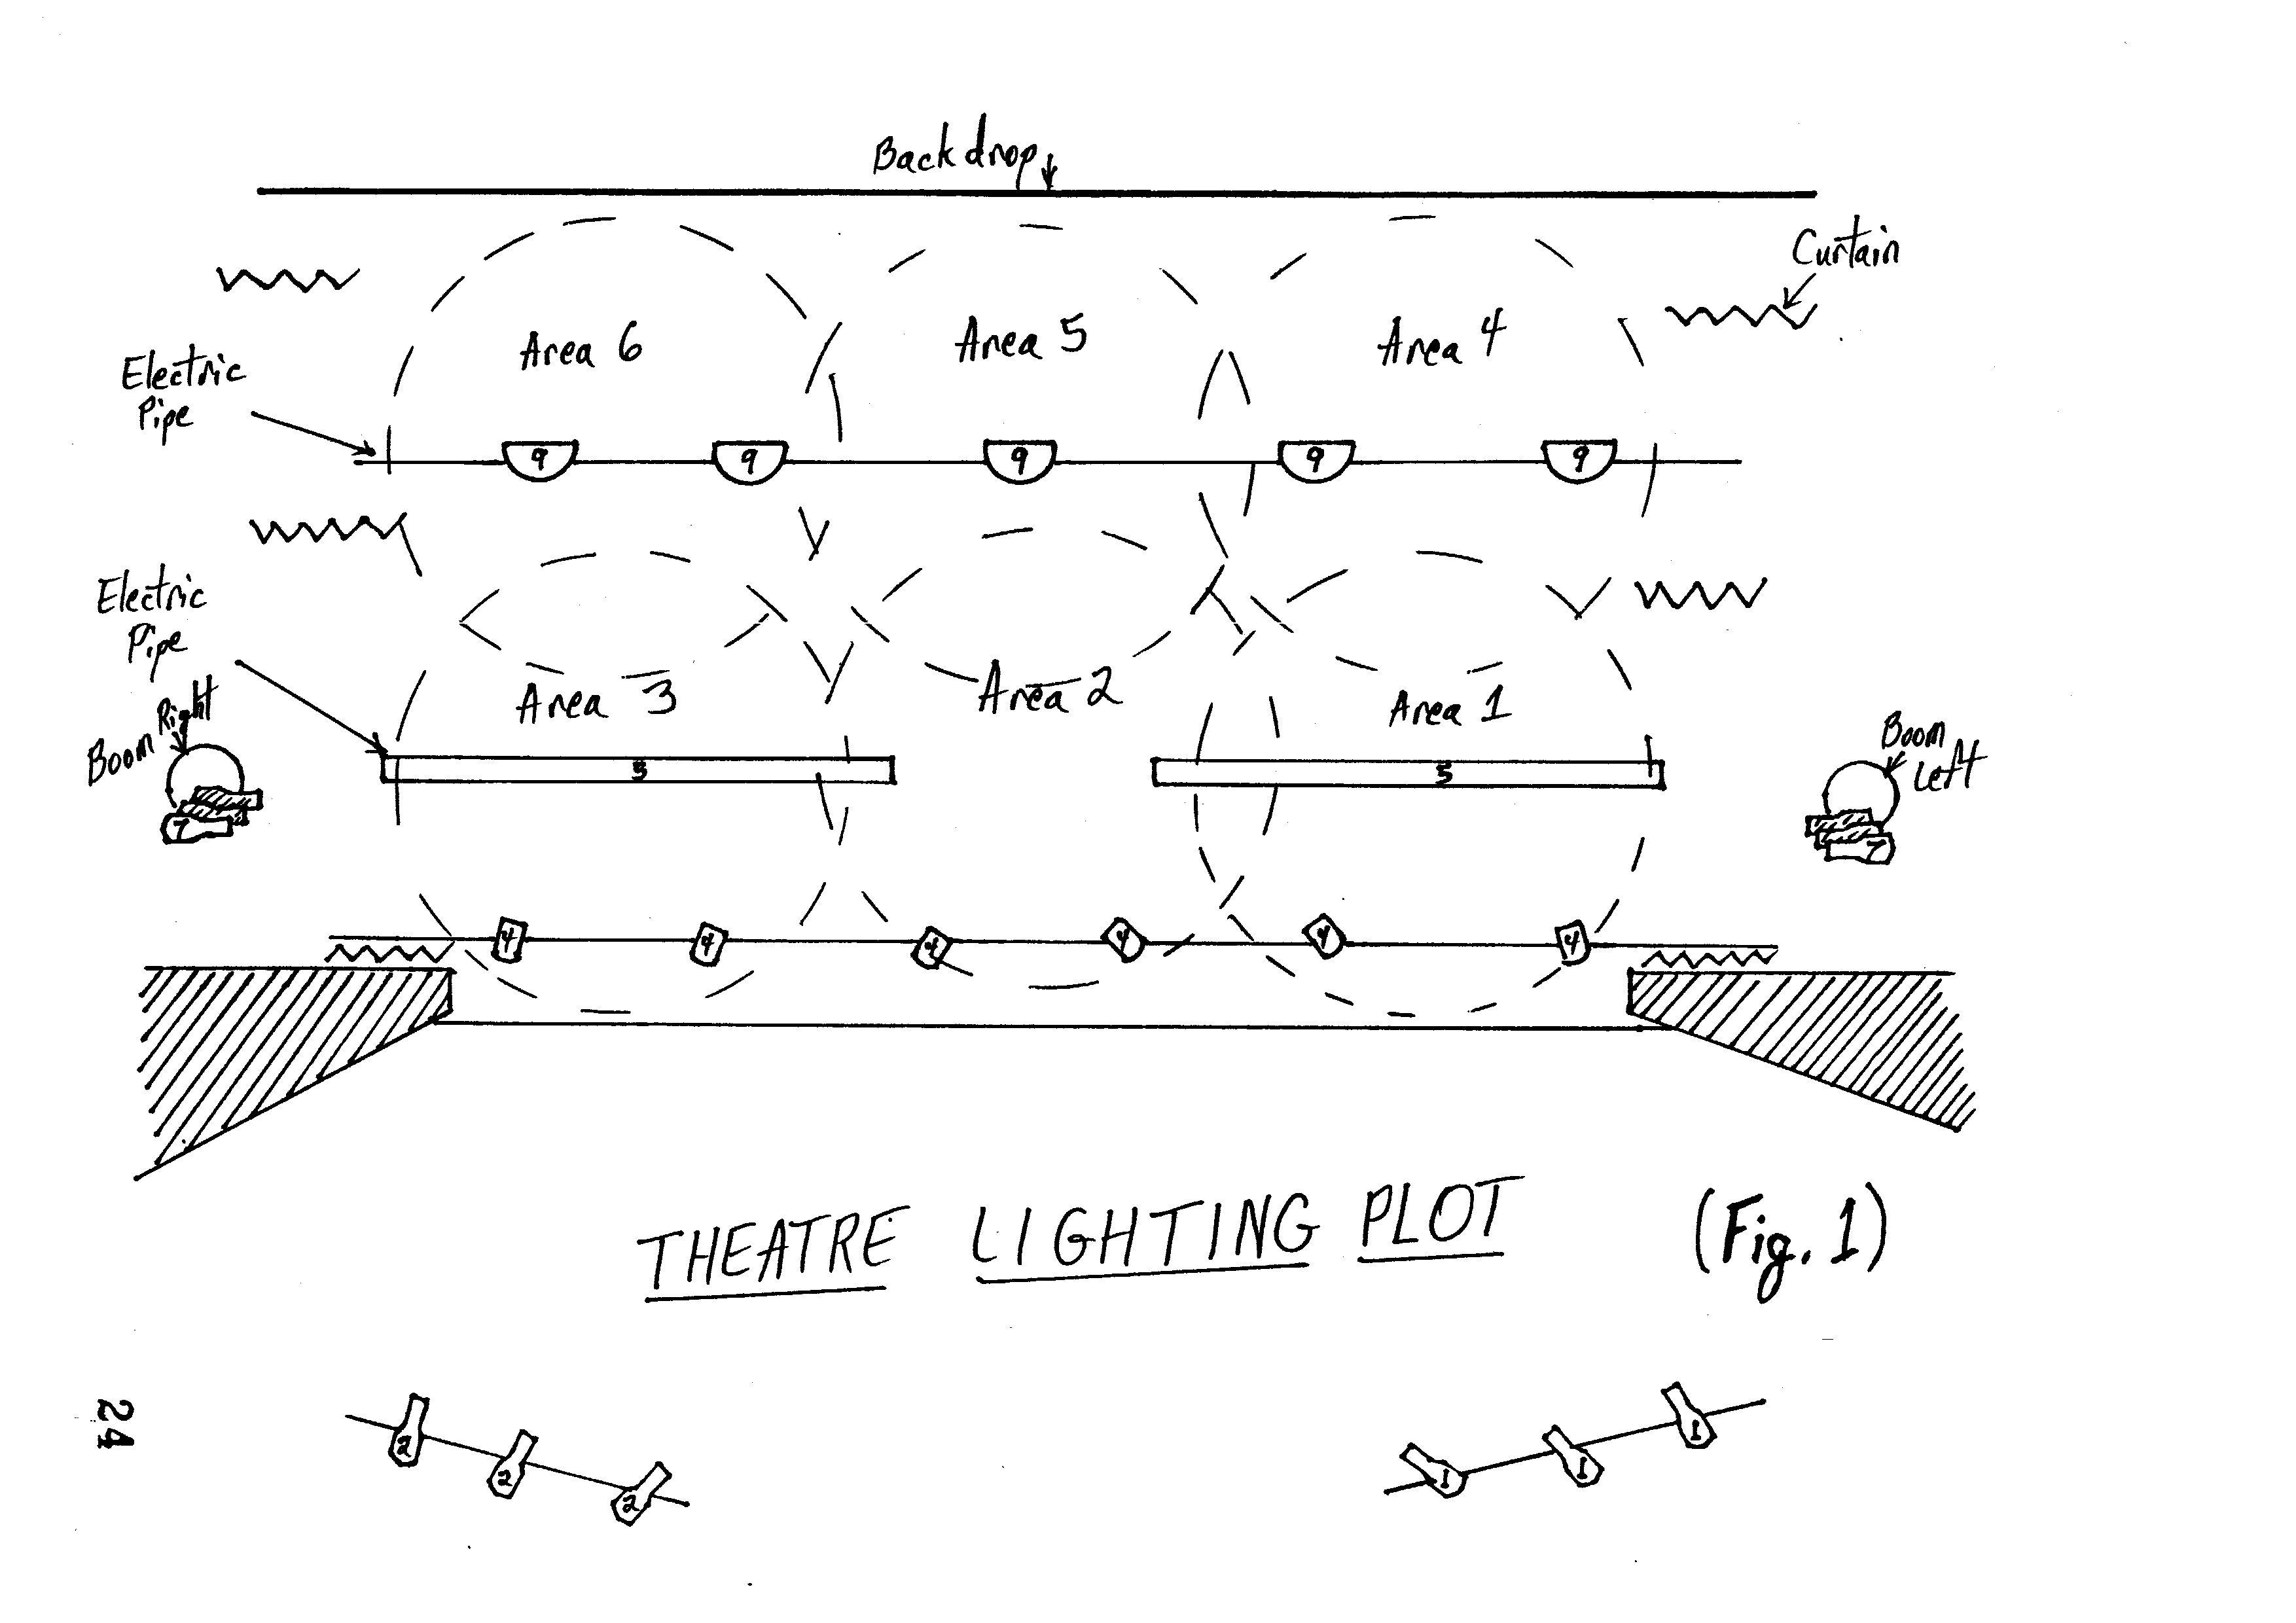 theatre light plot small venue  [ 3508 x 2480 Pixel ]